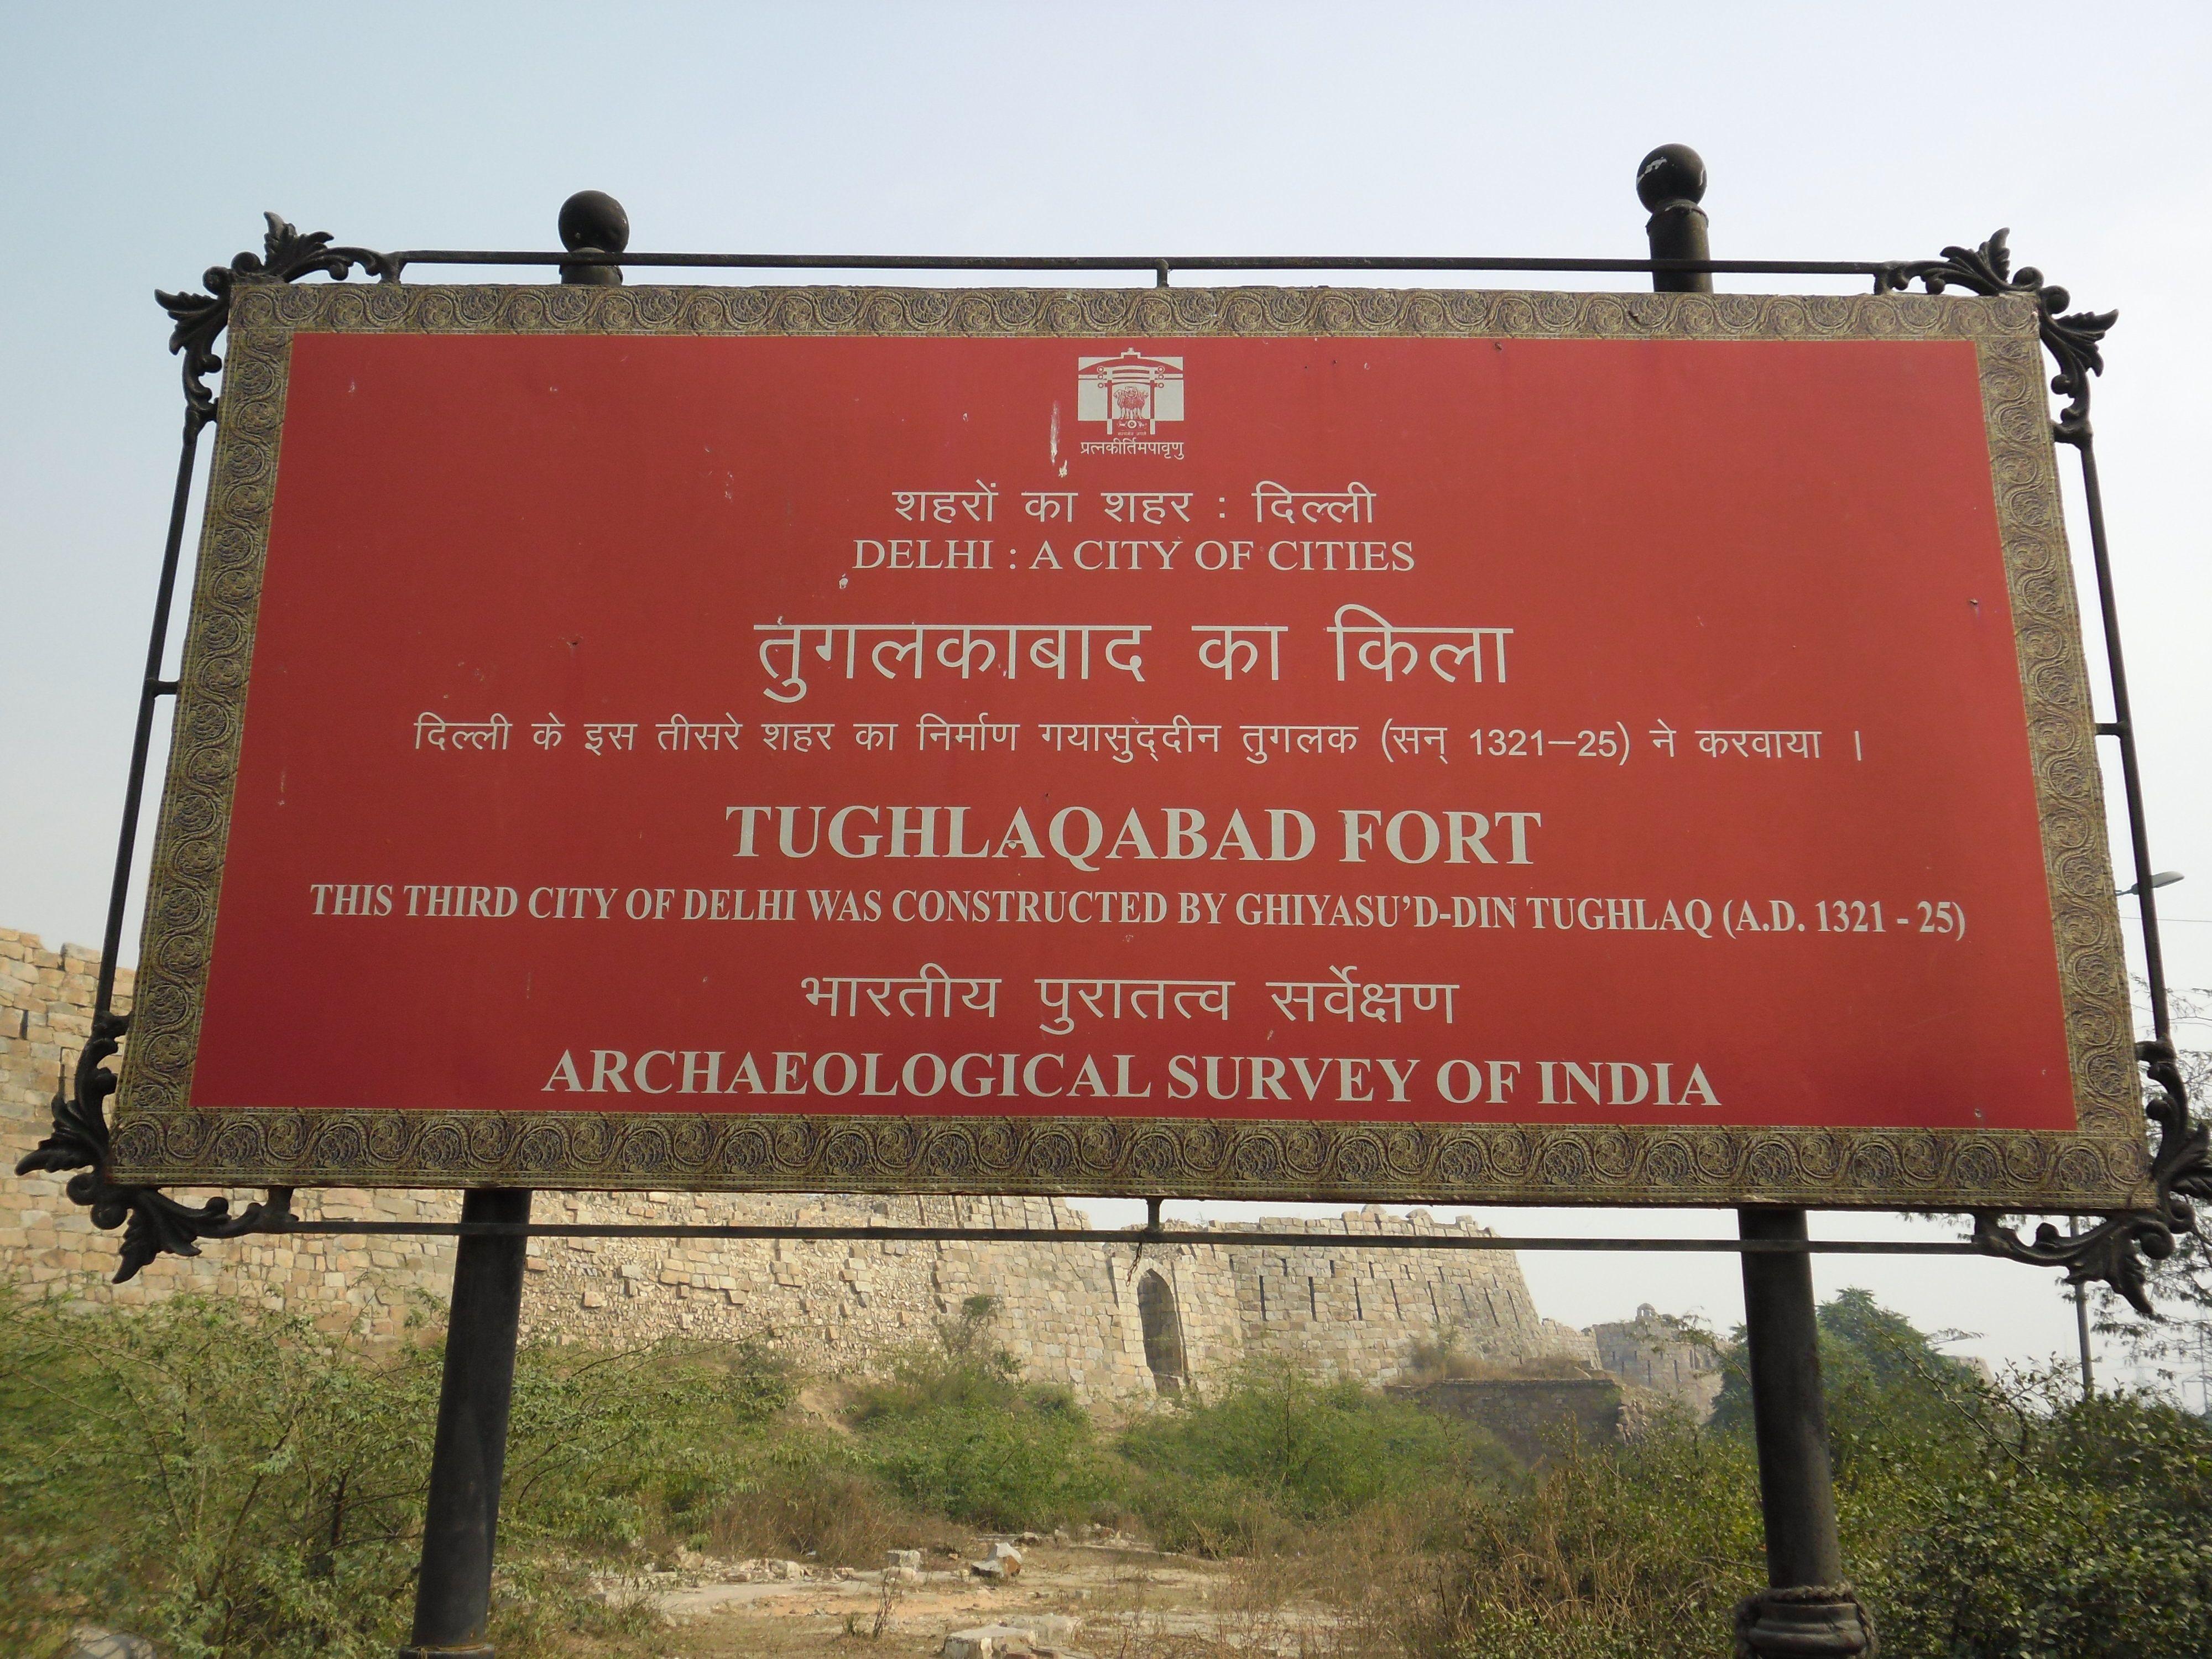 Tughluqabad (1323 A.D.).. The fourth city of Delhi.. http://travelerrohan.blogspot.in/2012/02/tughluqabad-1323-ad-legacy-of-delhi-vol.html